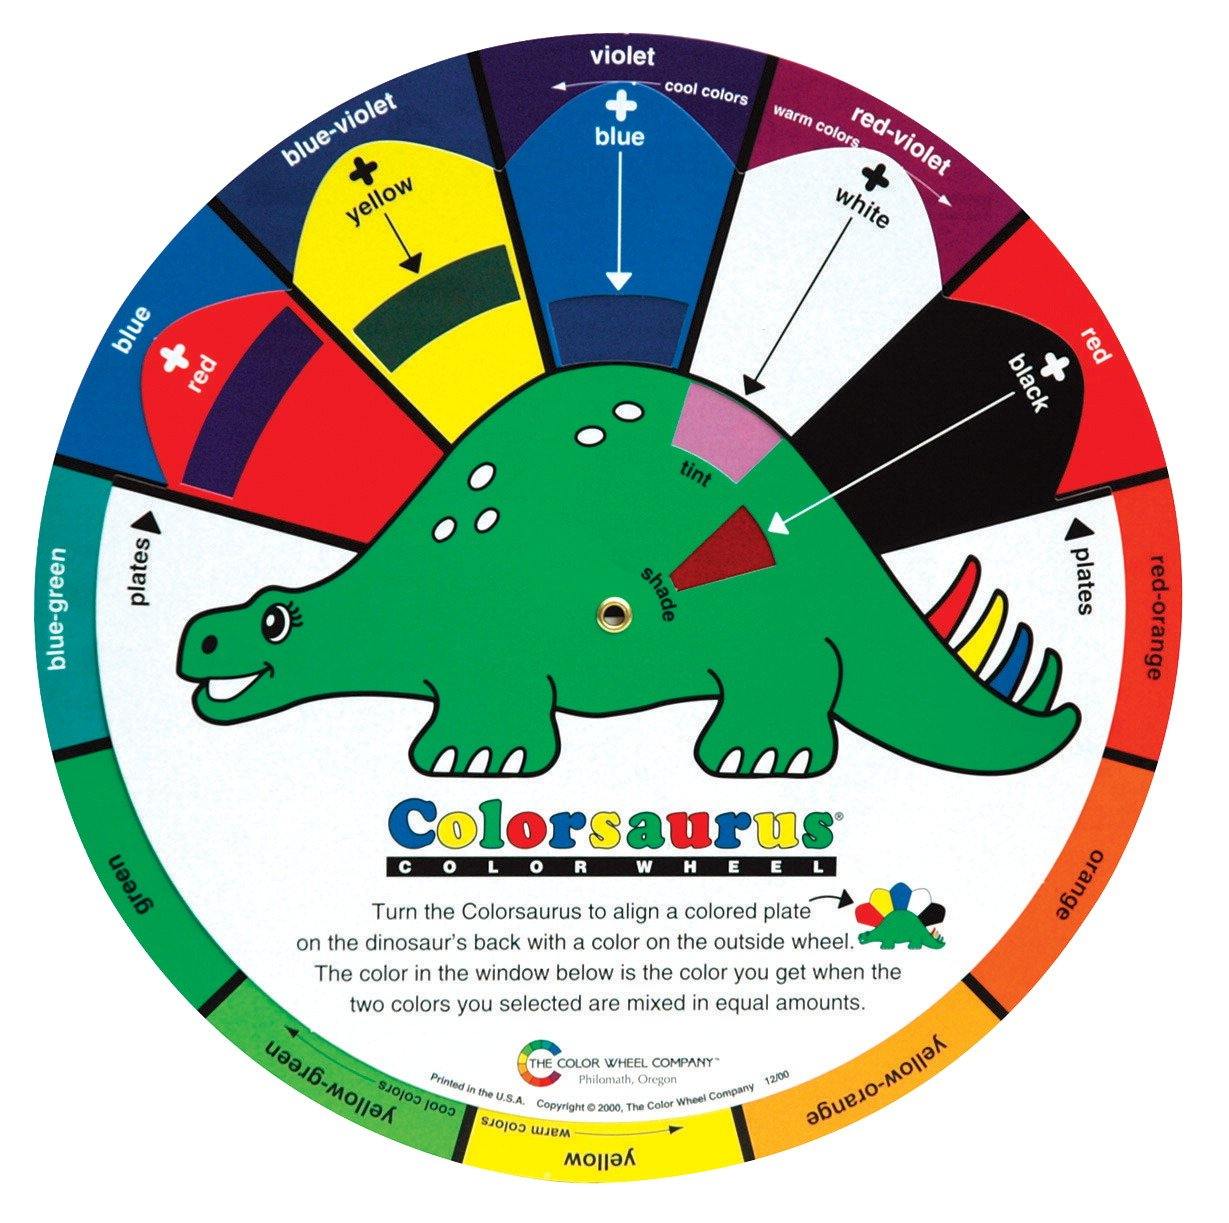 Co color wheel art - Amazon Com Color Wheel Colorsaurus Children Color Wheel 9 1 4 In Toys Games